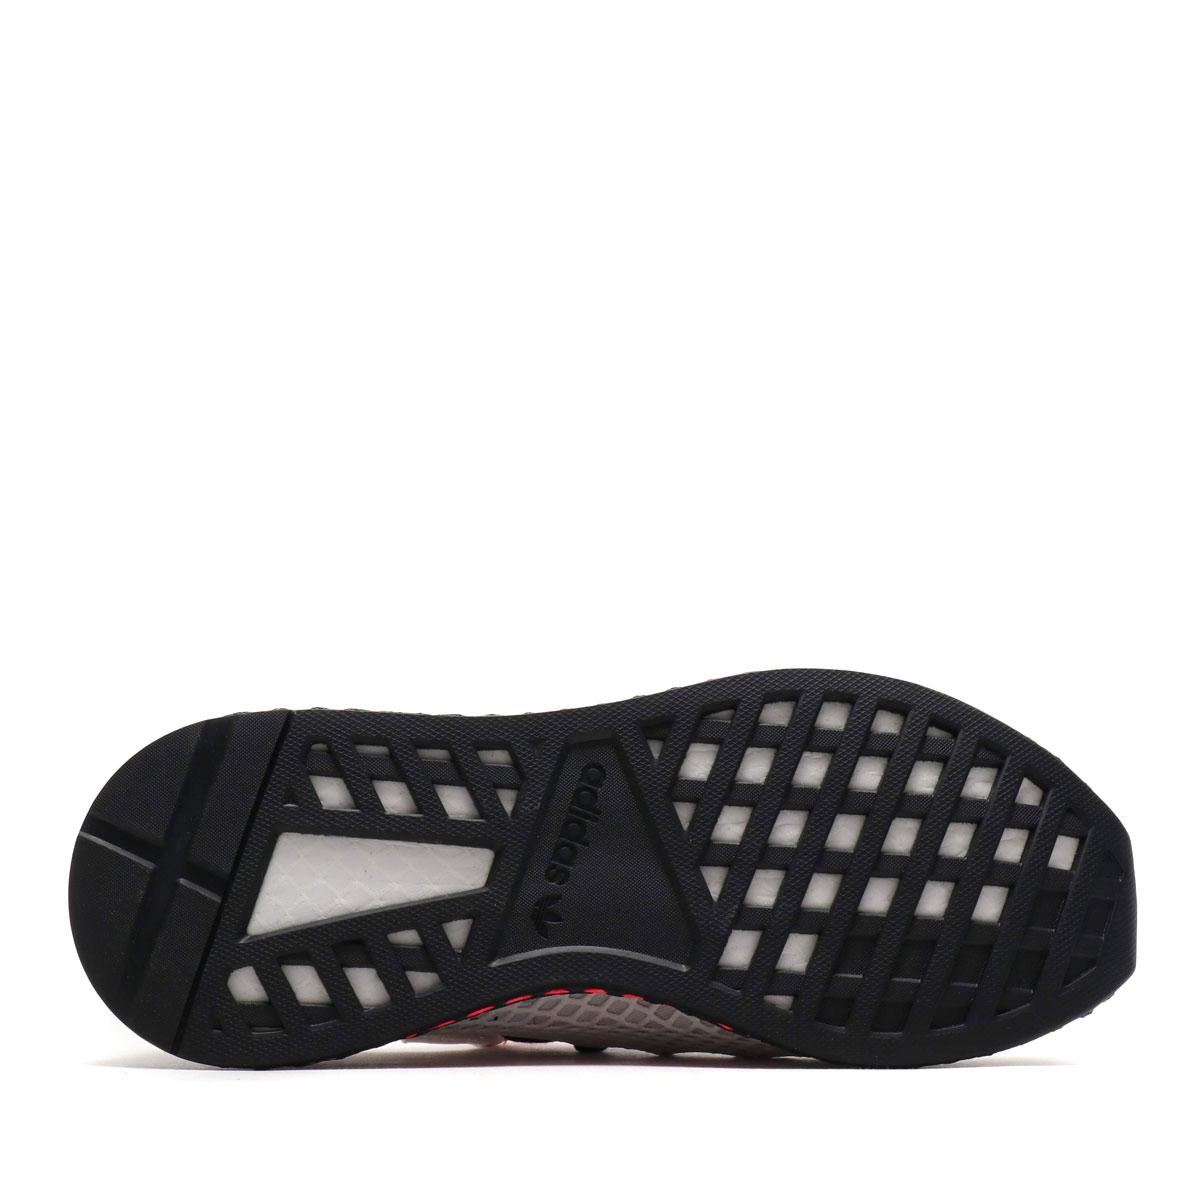 a24950307c1 adidas Originals DEERUPT RUNNER (RUNNING WHITE CORE BLACK SHOCK RED)  (アディダスオリジナルスディーラプトランナー)